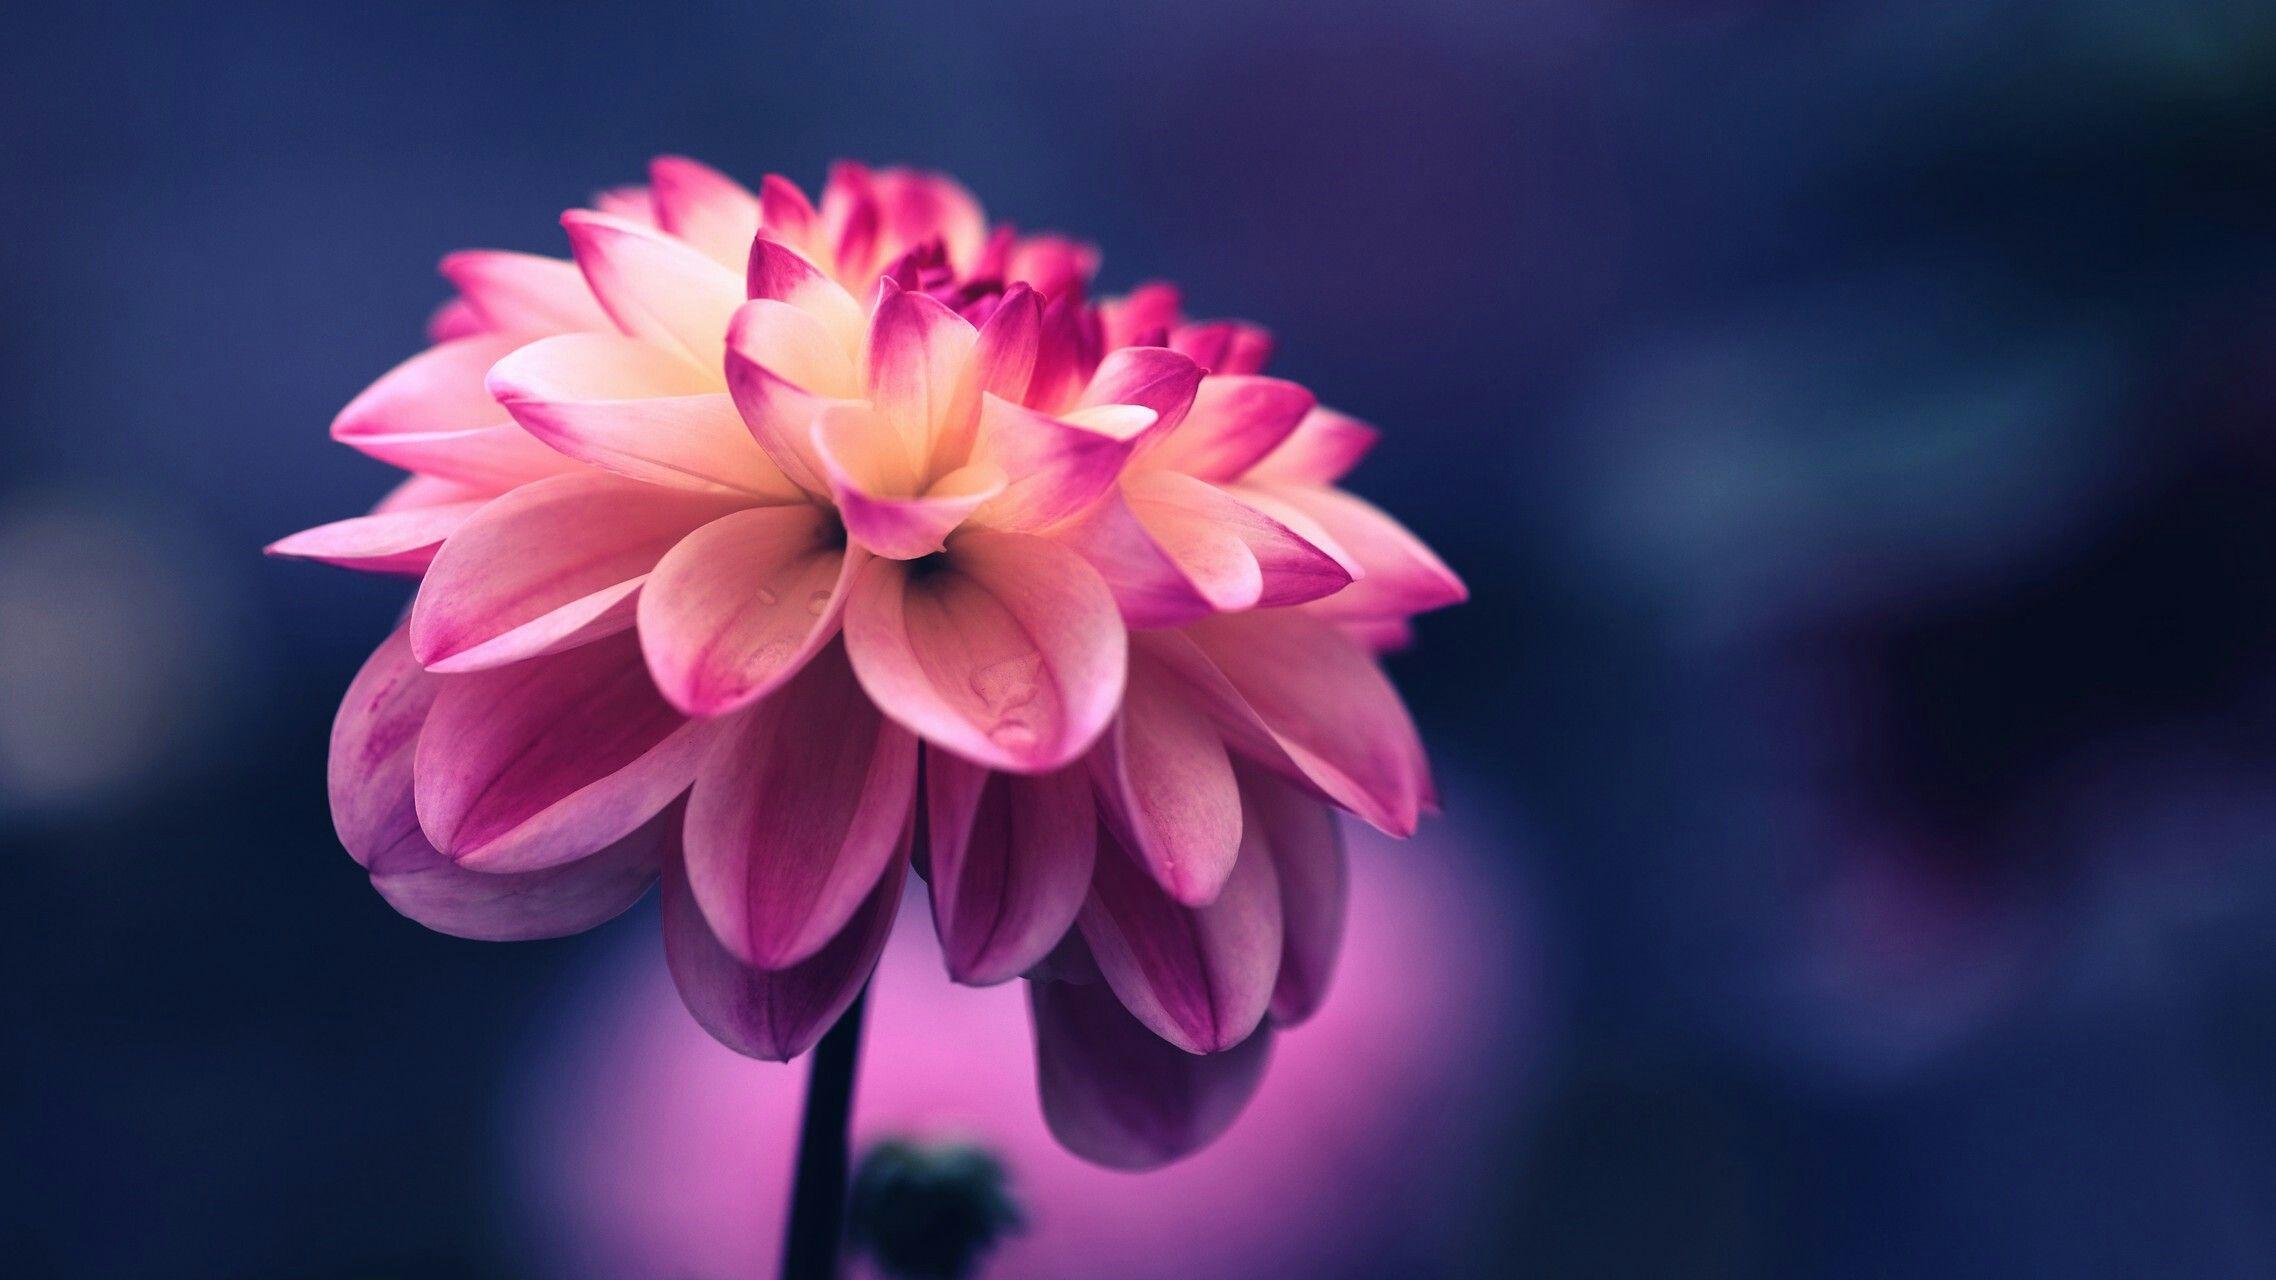 Lotus The National Flower Of India Wallpaper Pinterest Lotus